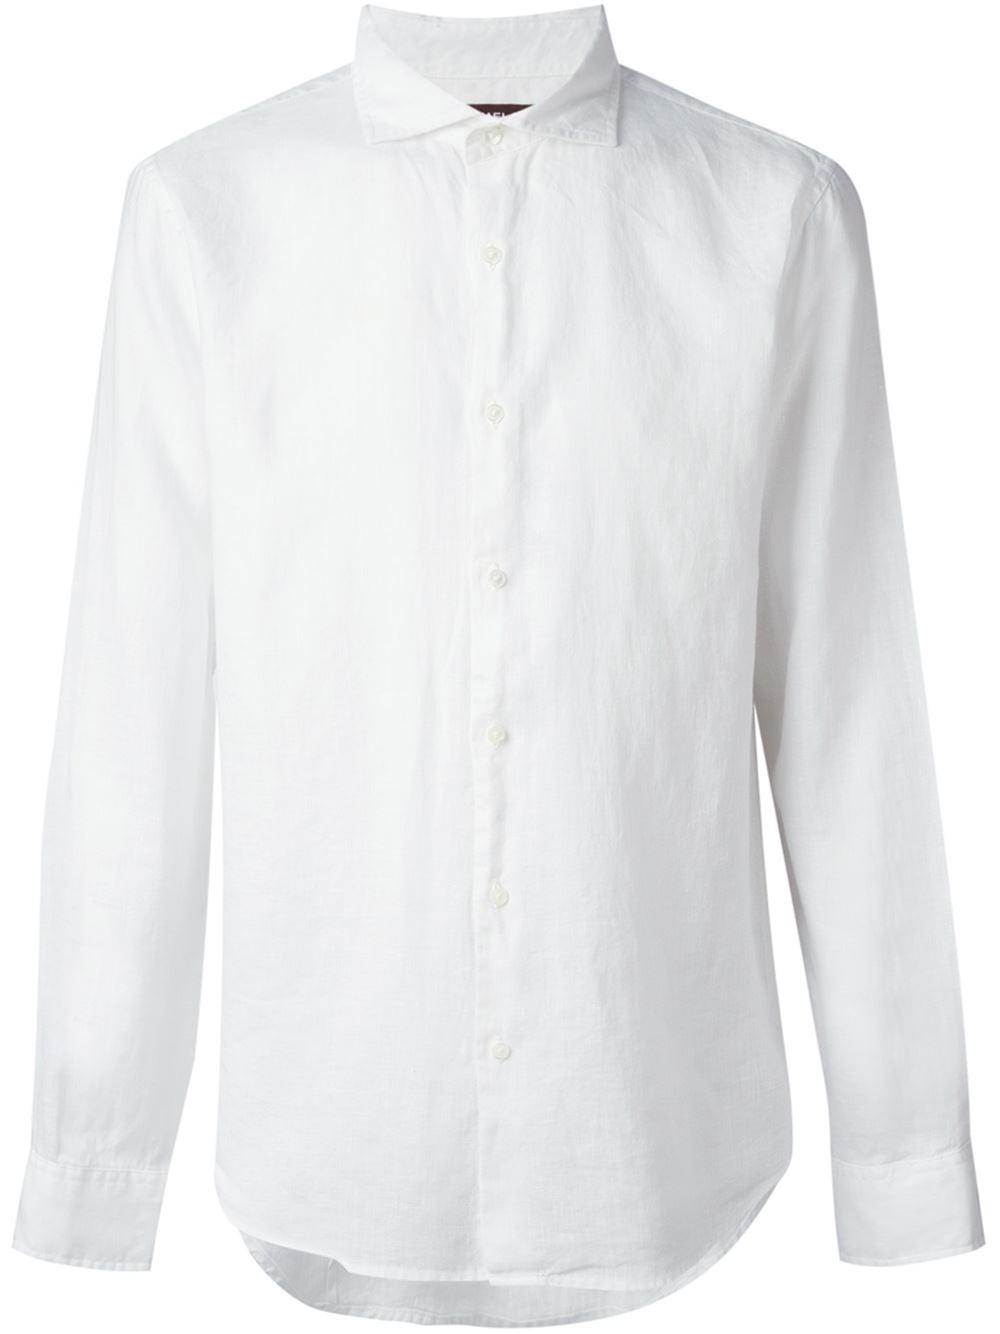 Michael kors spread collar shirt in white for men lyst for What is a spread collar shirt